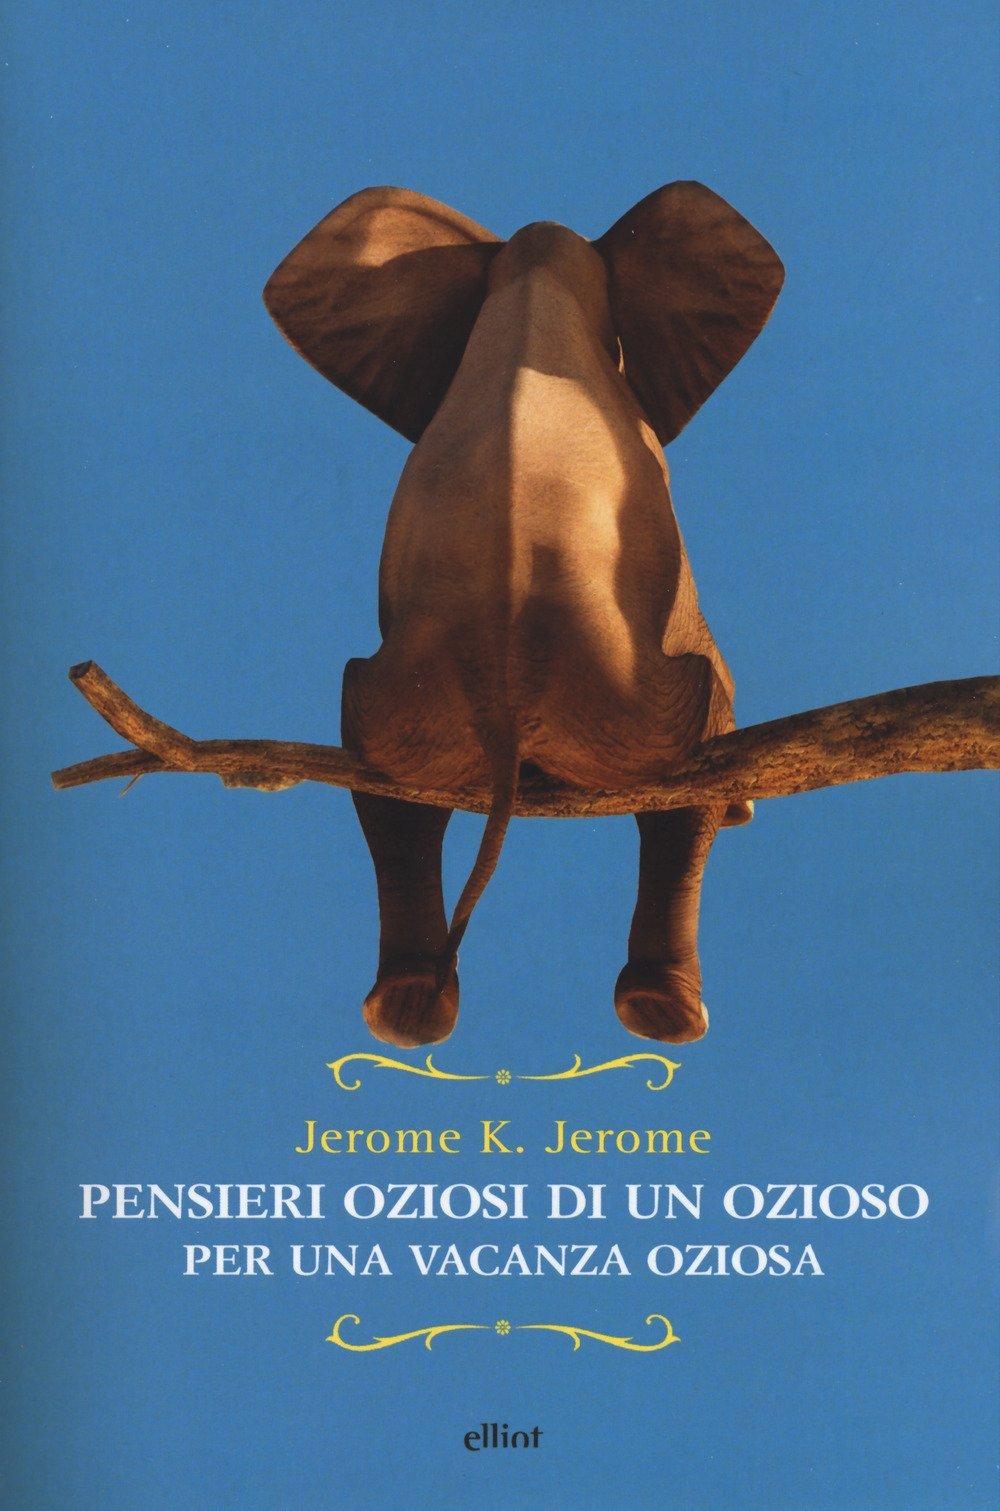 Jurassic Park (Italian-language Edition) by Michael Crichton | NOOK Book (eBook) | Barnes & Noble®